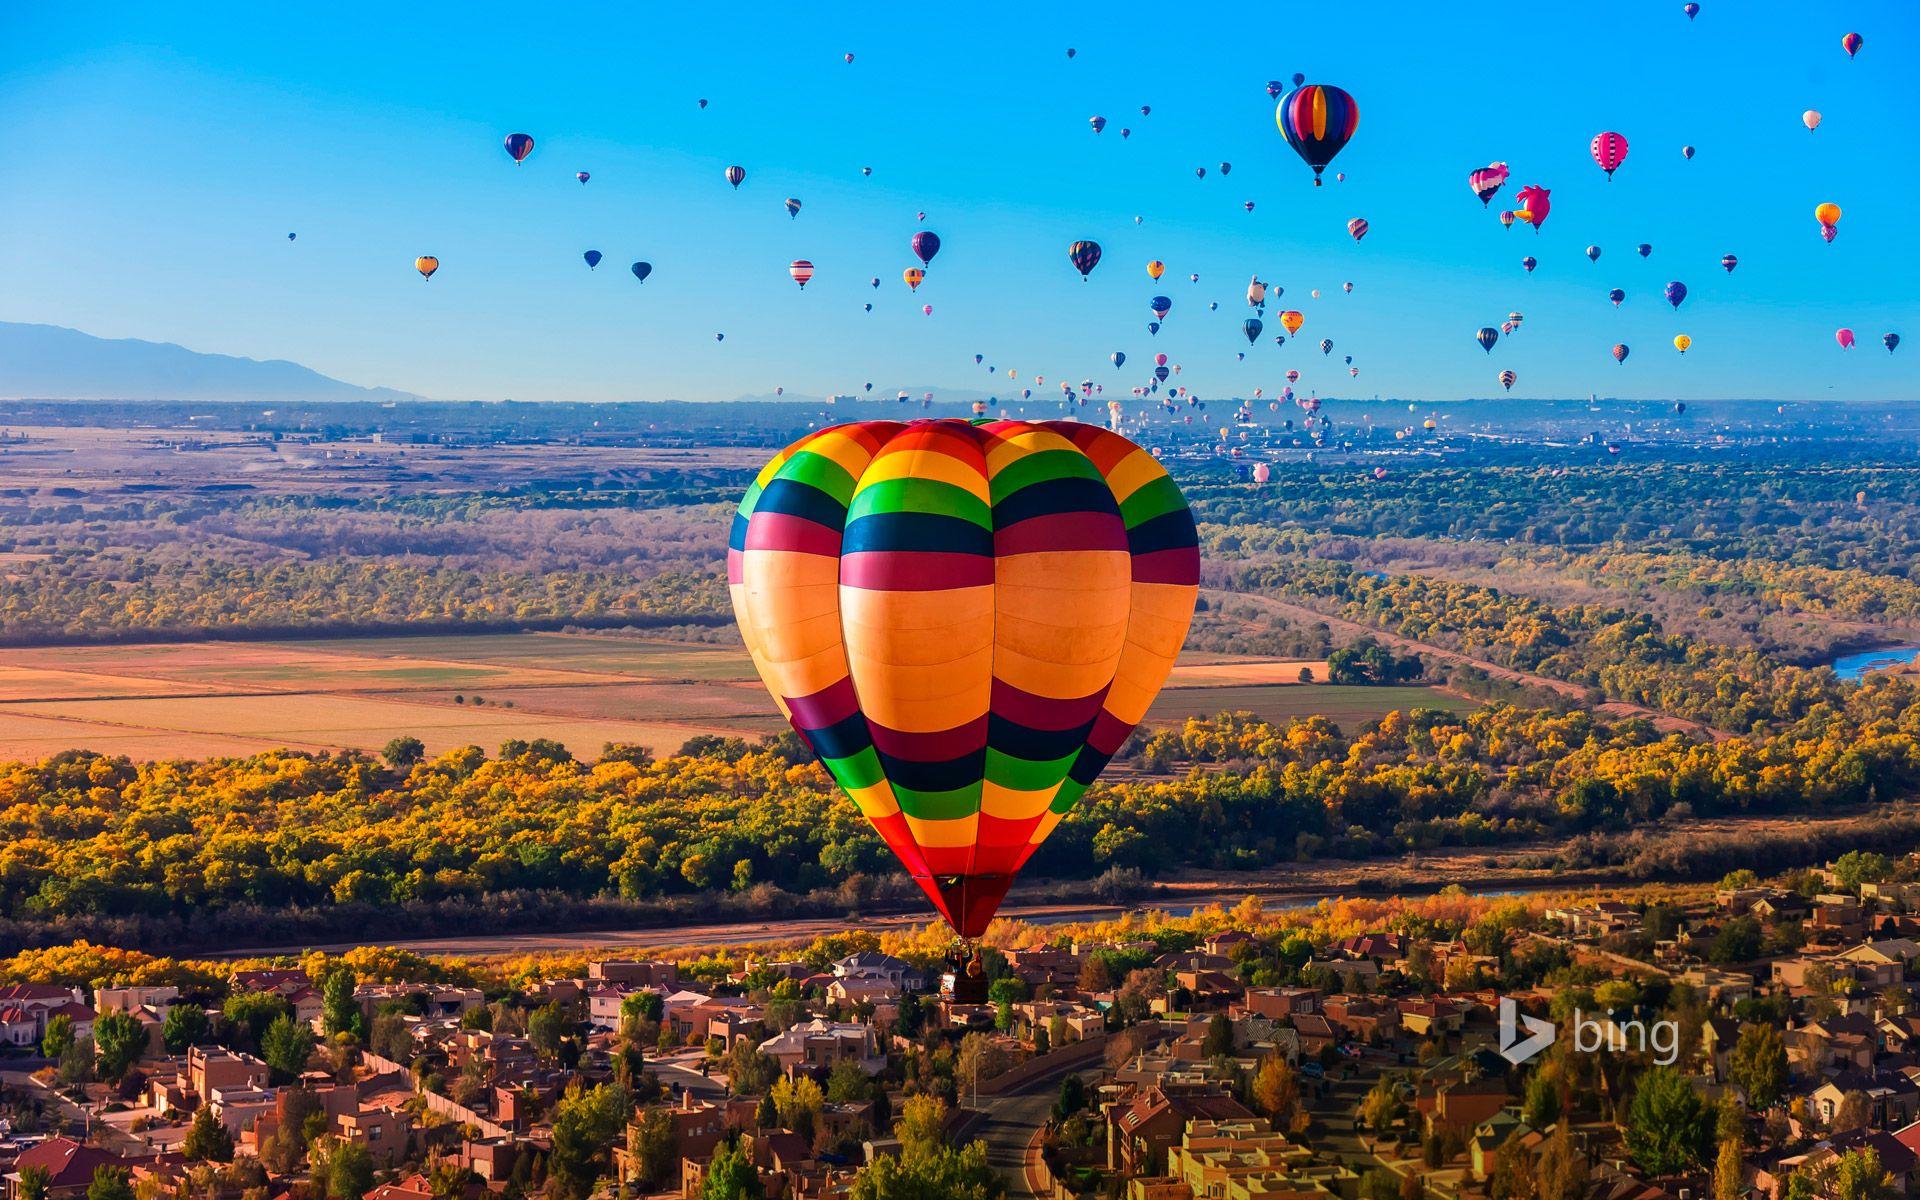 The Albuquerque International Balloon Fiesta is the world